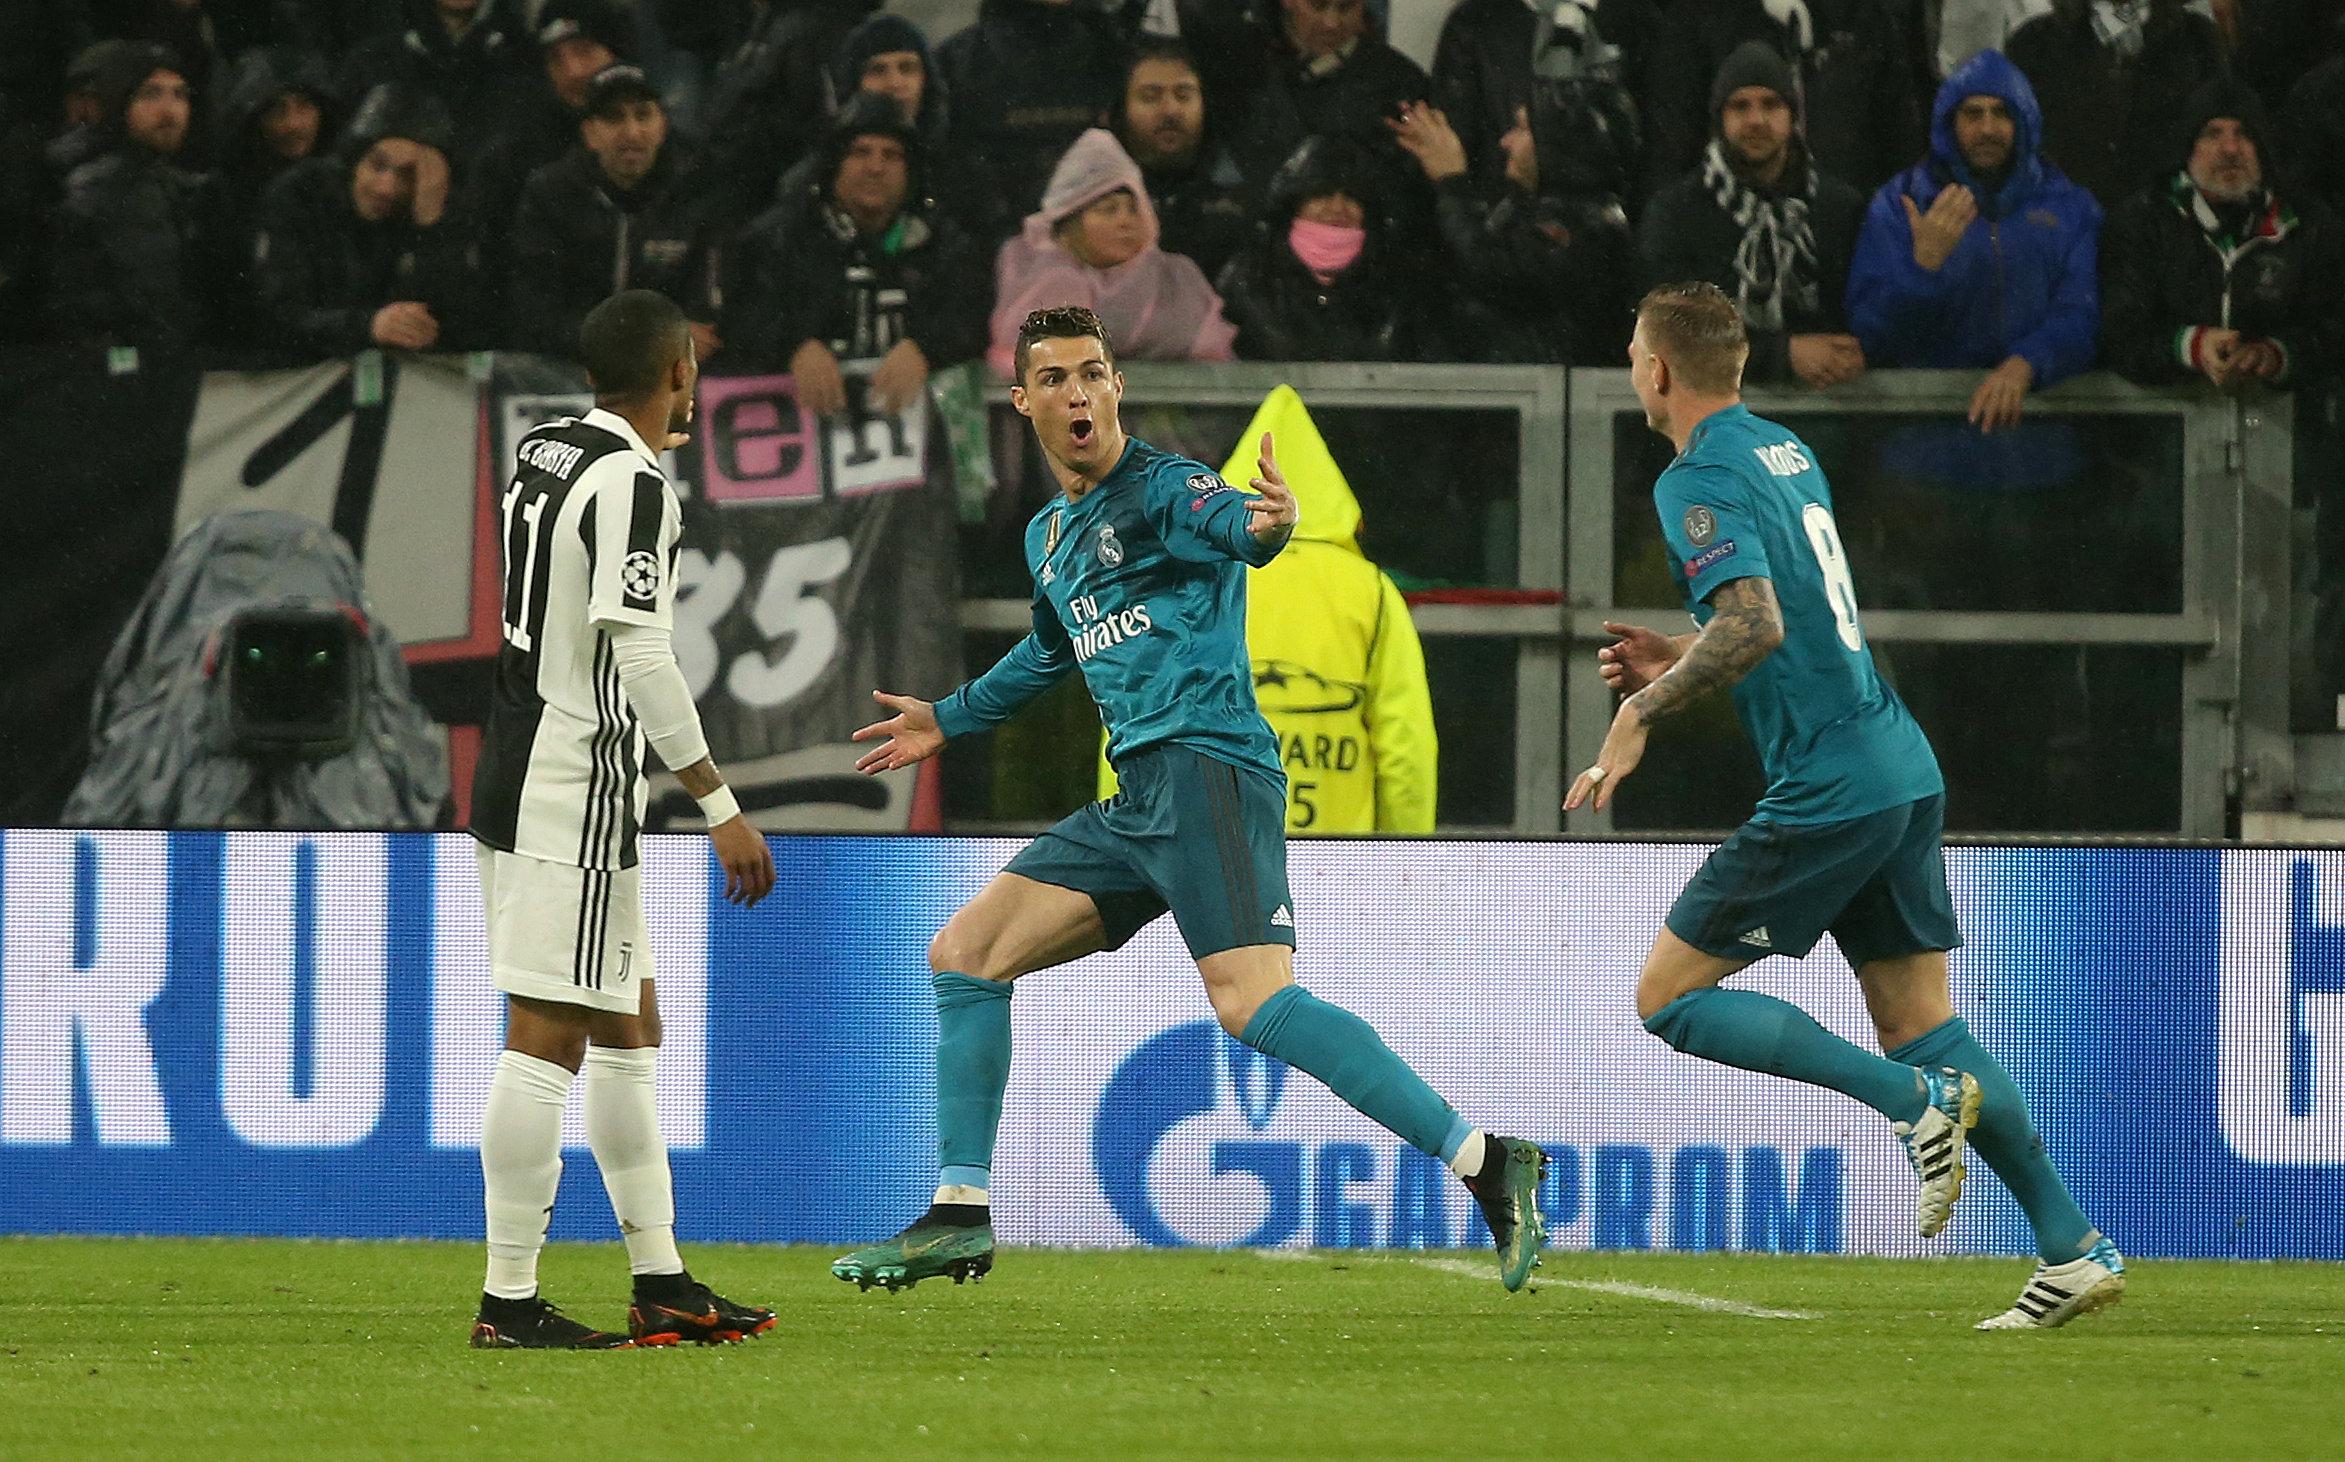 Ronaldo R U1ef1c S U00e1ng R M U0111 U1eb7t M U1ed9t Ch U00e2n V U00e0o B U00e1n K U1ebft Tu U1ed5i Tr U1ebb